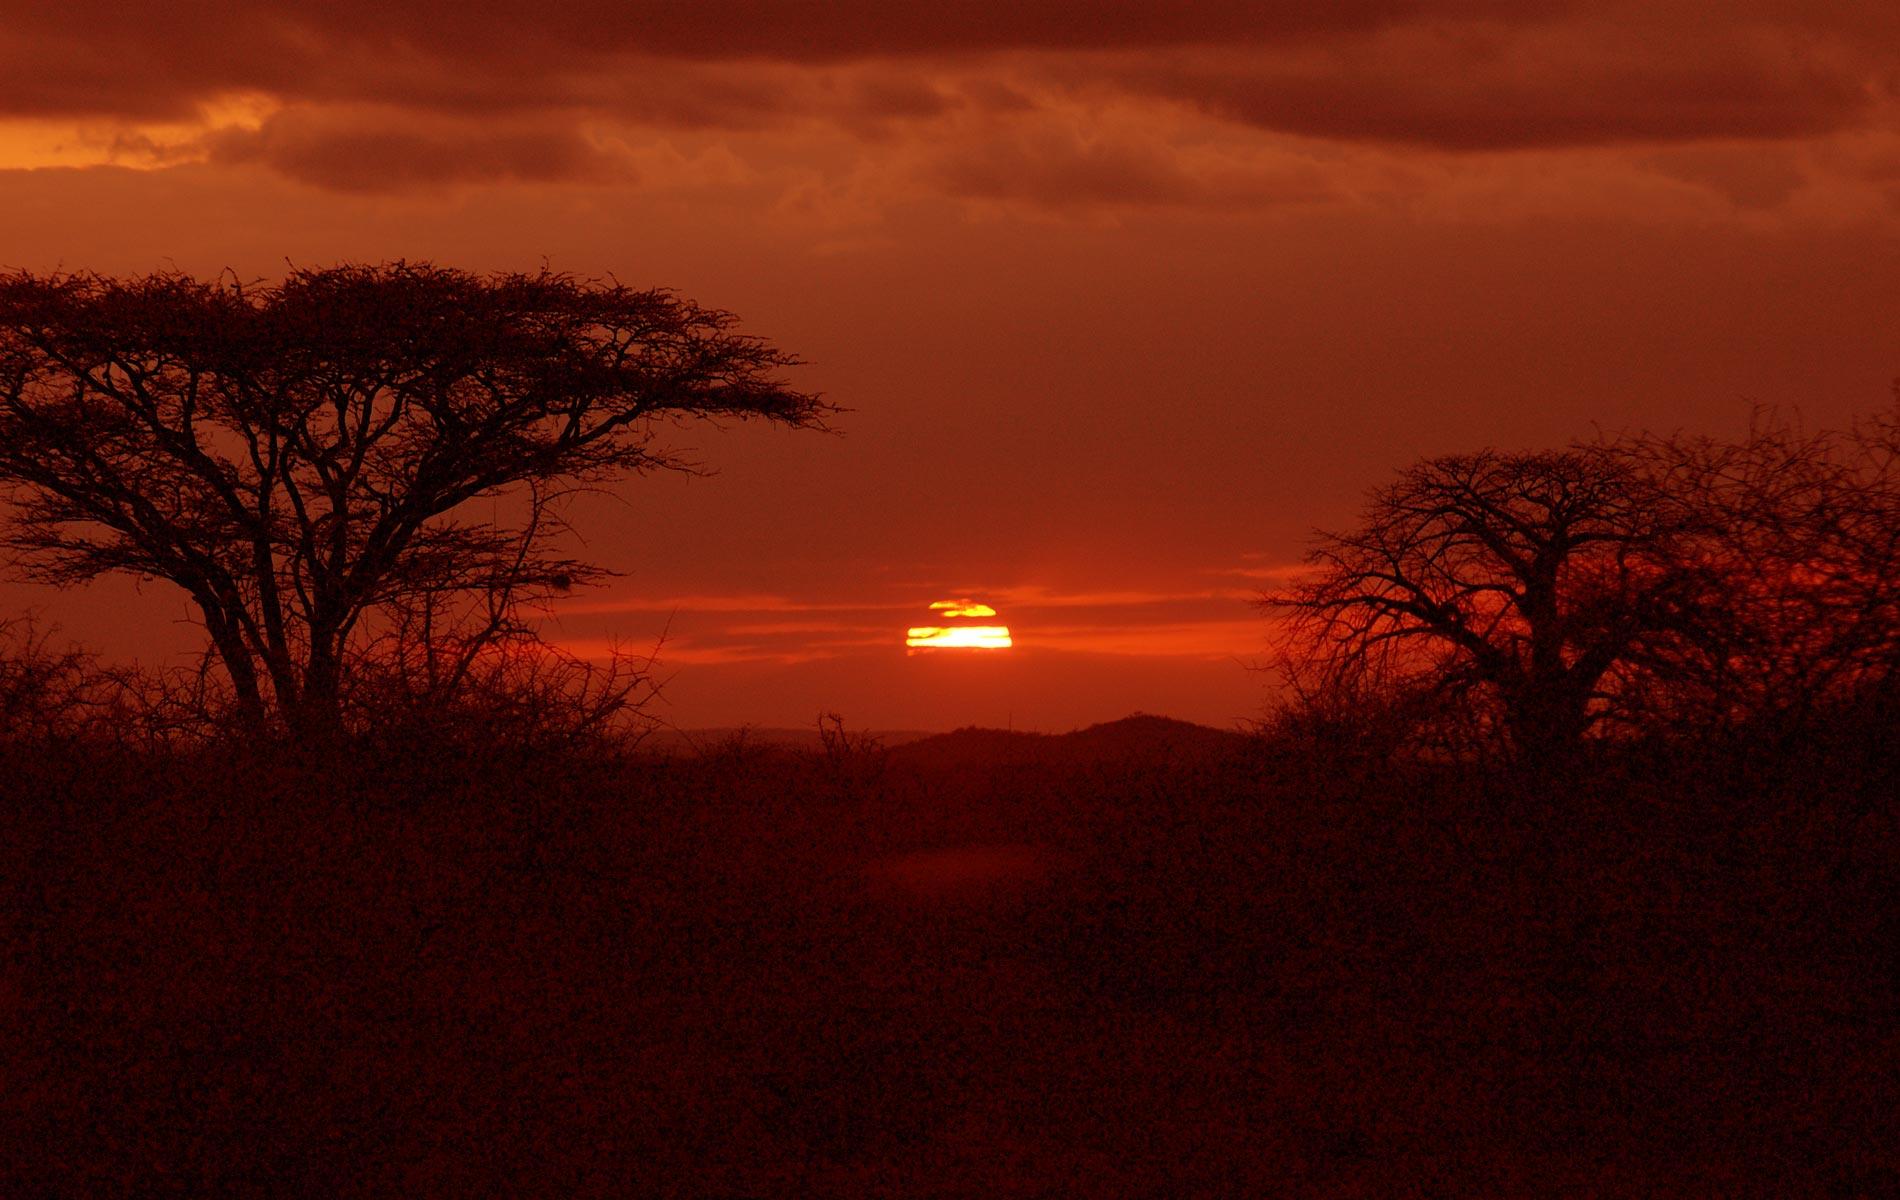 KENYA - TSAVO EAST NAT. PARK - © Graziano Villa